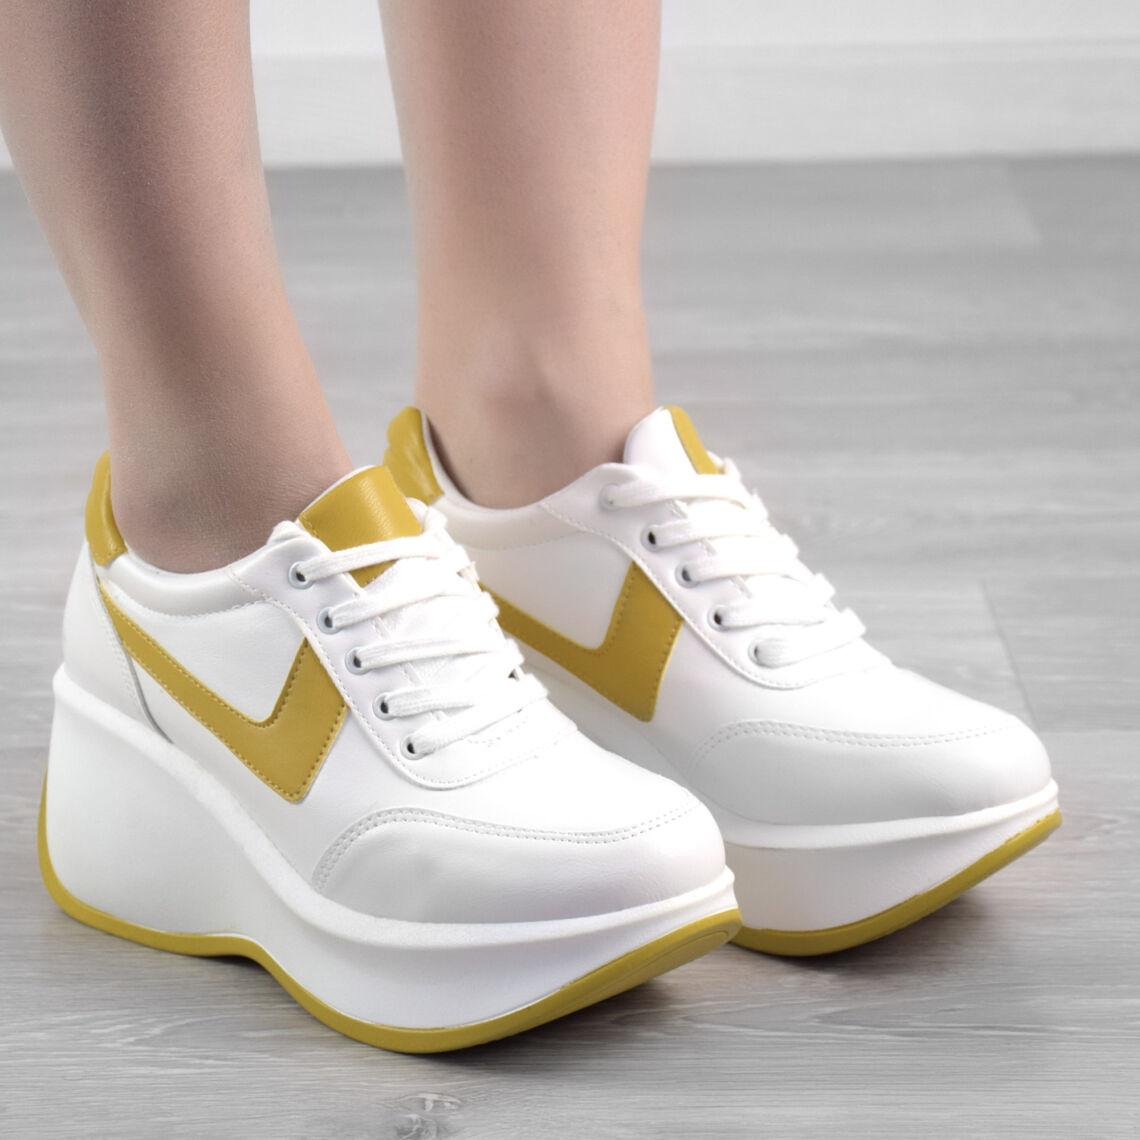 ec719fb67d Fehér/sárga női műbőr magas talpú cipő - MAGAS TALPÚ - Női cipő ...